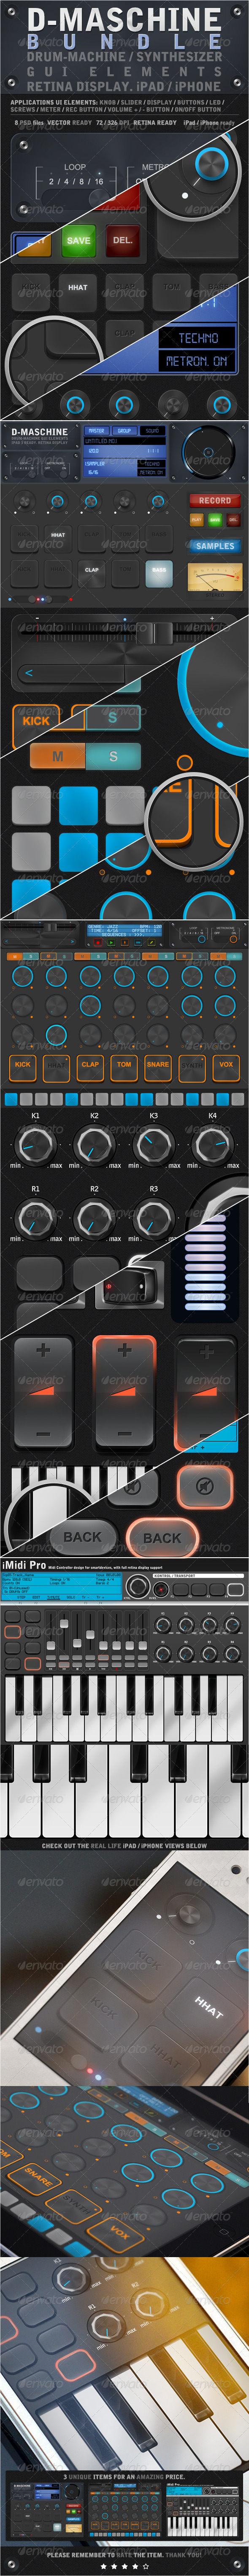 GraphicRiver D-Maschine iPad iPhone UI Elements Bundle 4543443